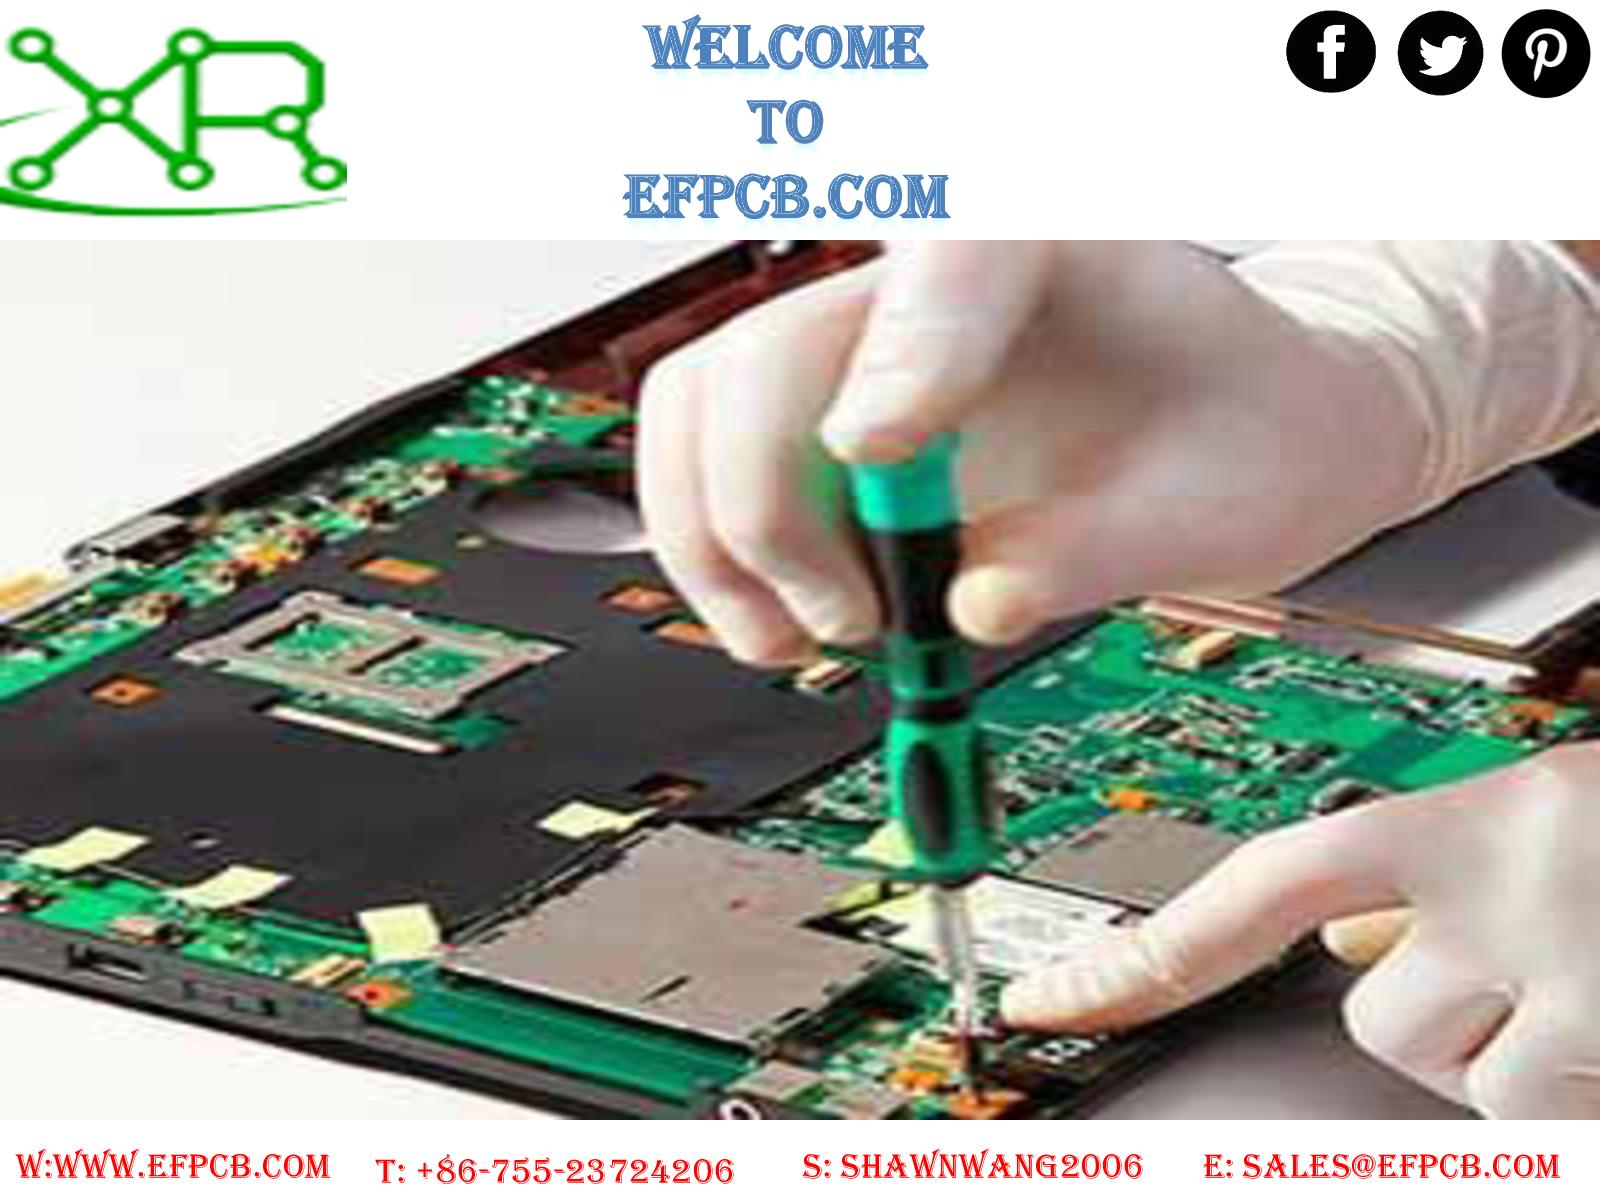 Calamo Hdi Microvia Pcb At Efpcb Fr4 Circuit Board Led Aluminum Mobile Phone Motherboard Electronic